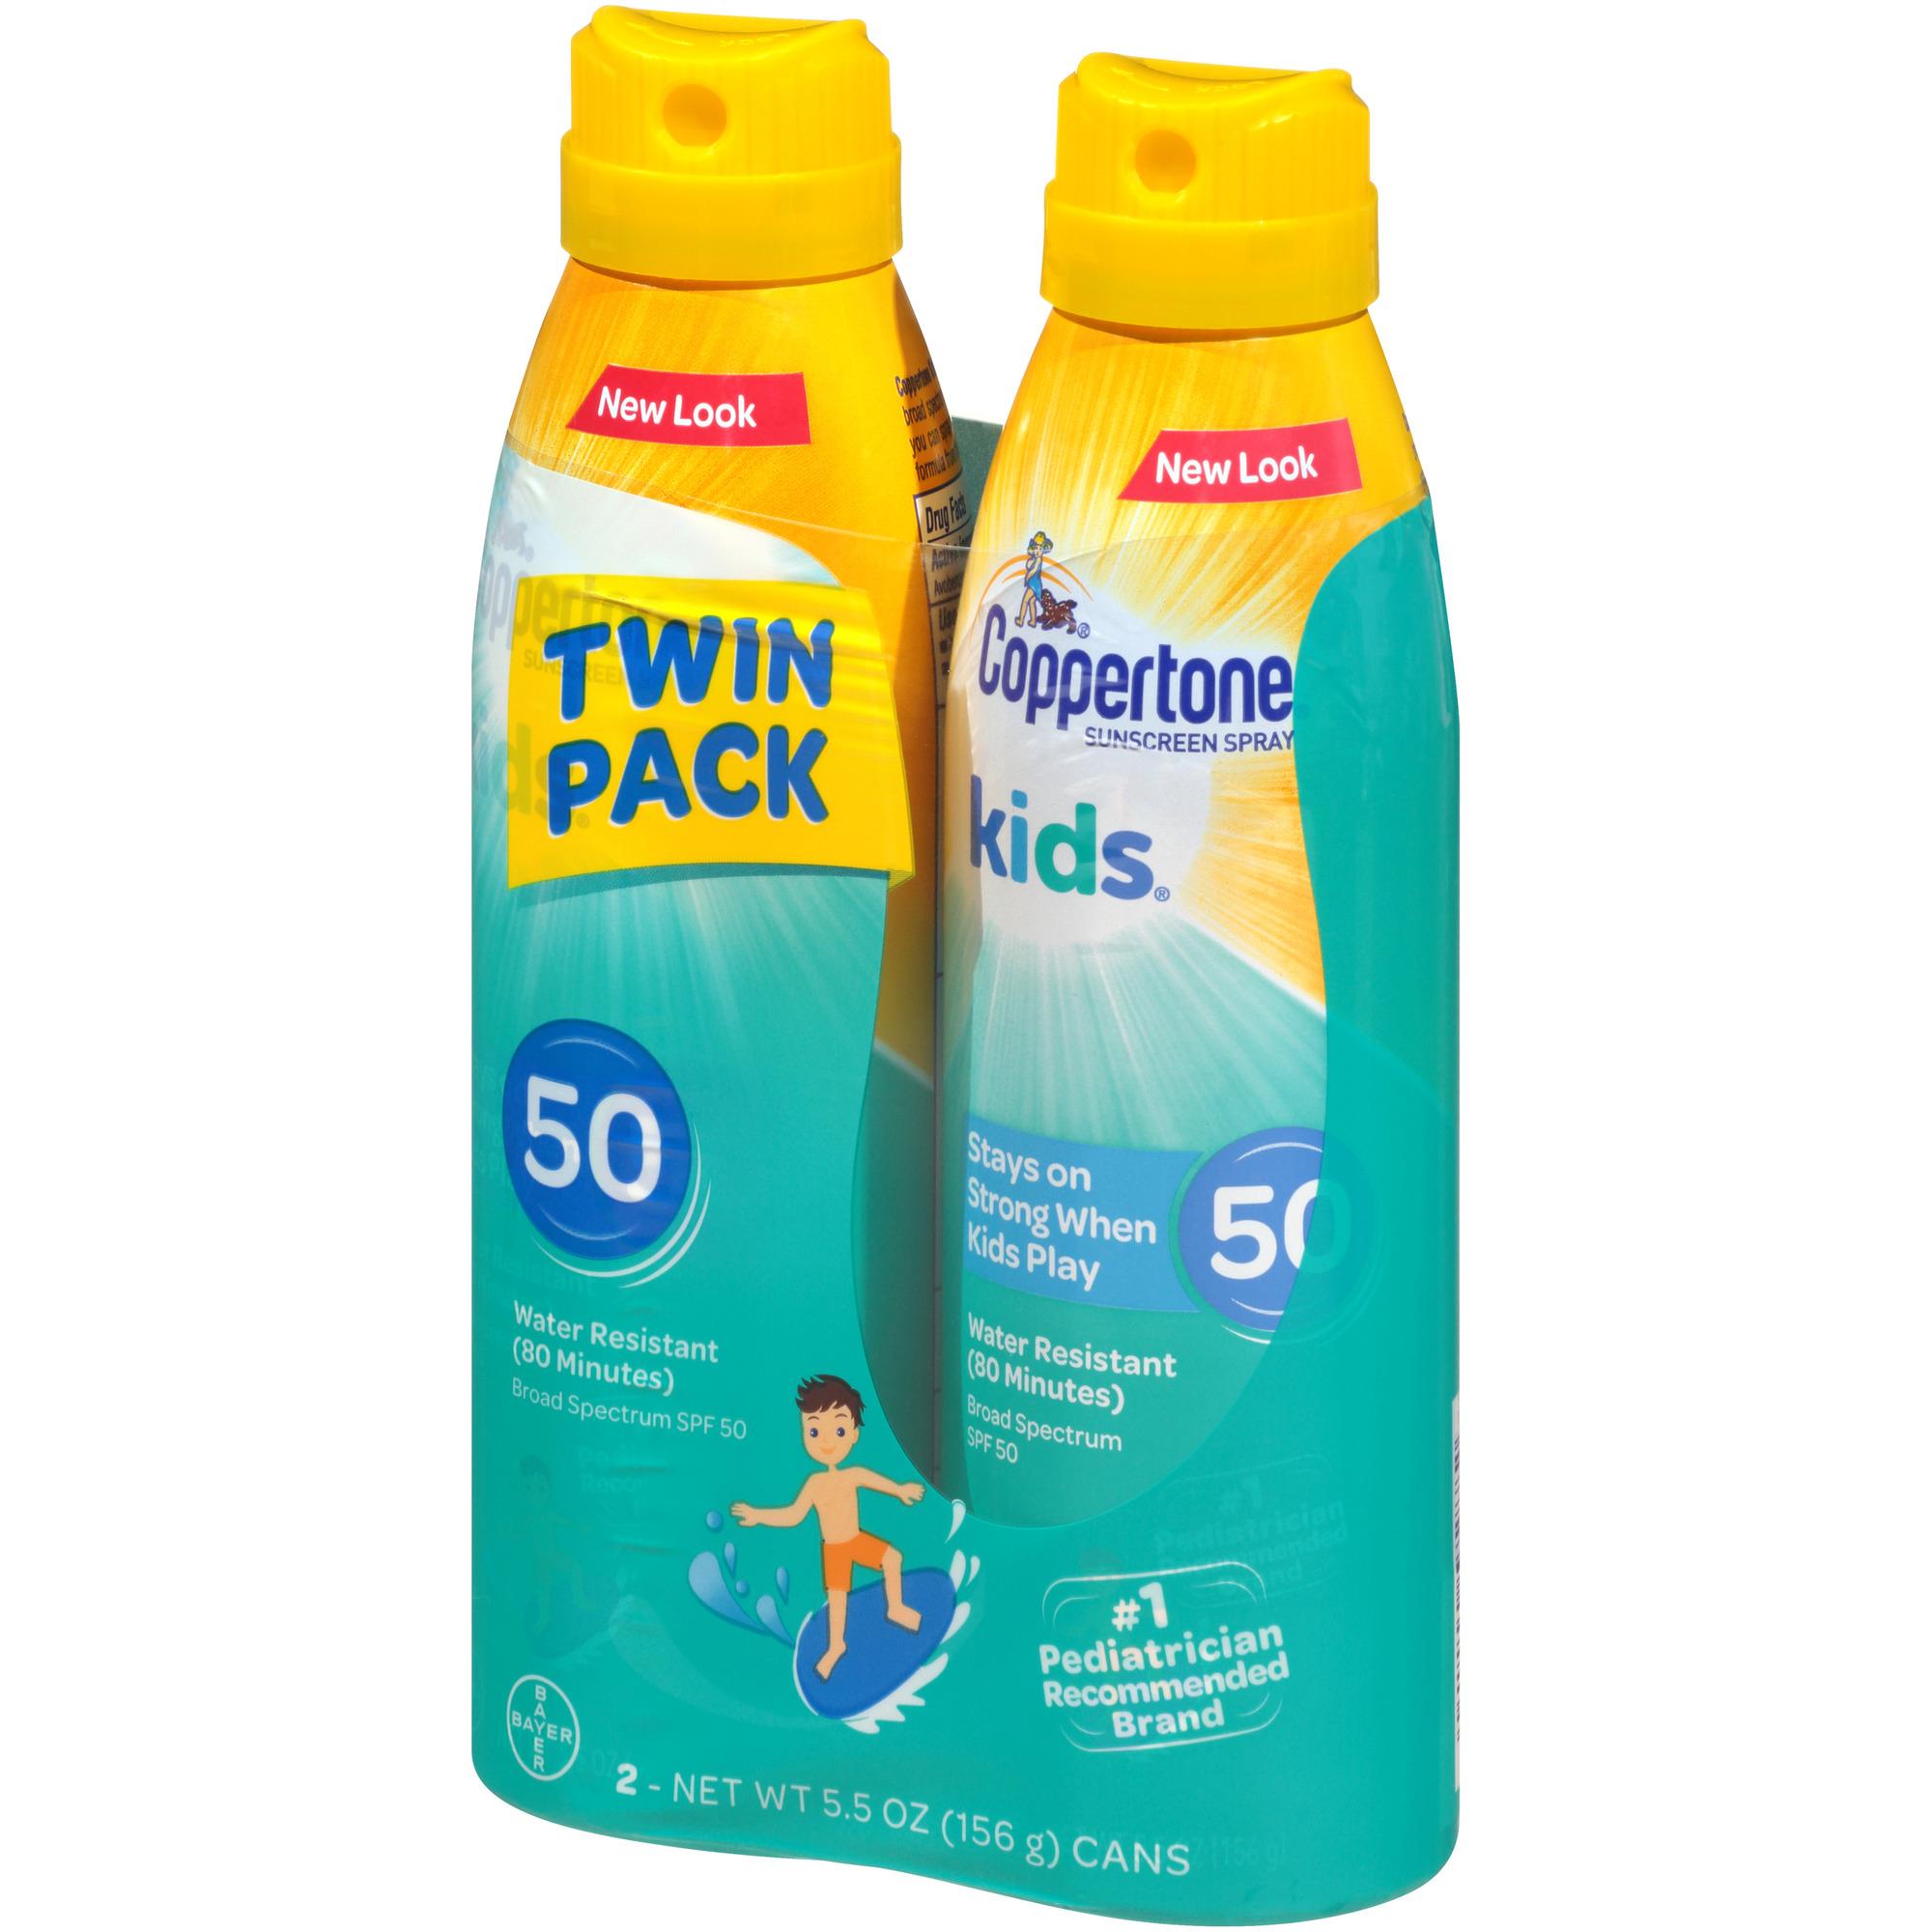 bdad8252c54ce Coppertone® Kids® Broad Spectrum SPF 50 Sunscreen Spray 2-5.5 oz ...